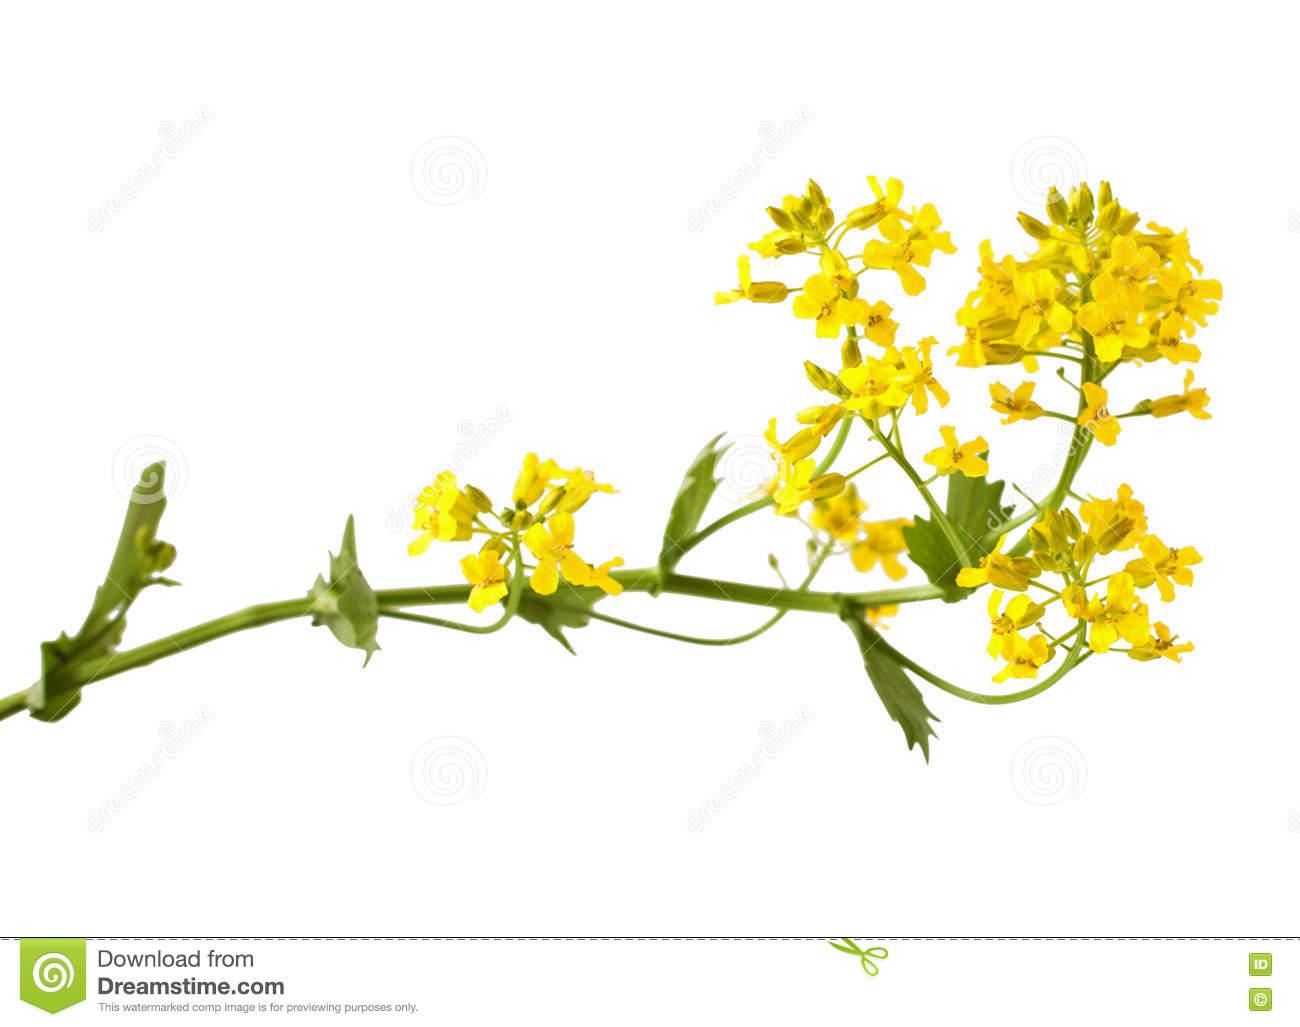 Flowering Barbarea Vulgaris Or Yellow Rocket Plant Stock Photo.